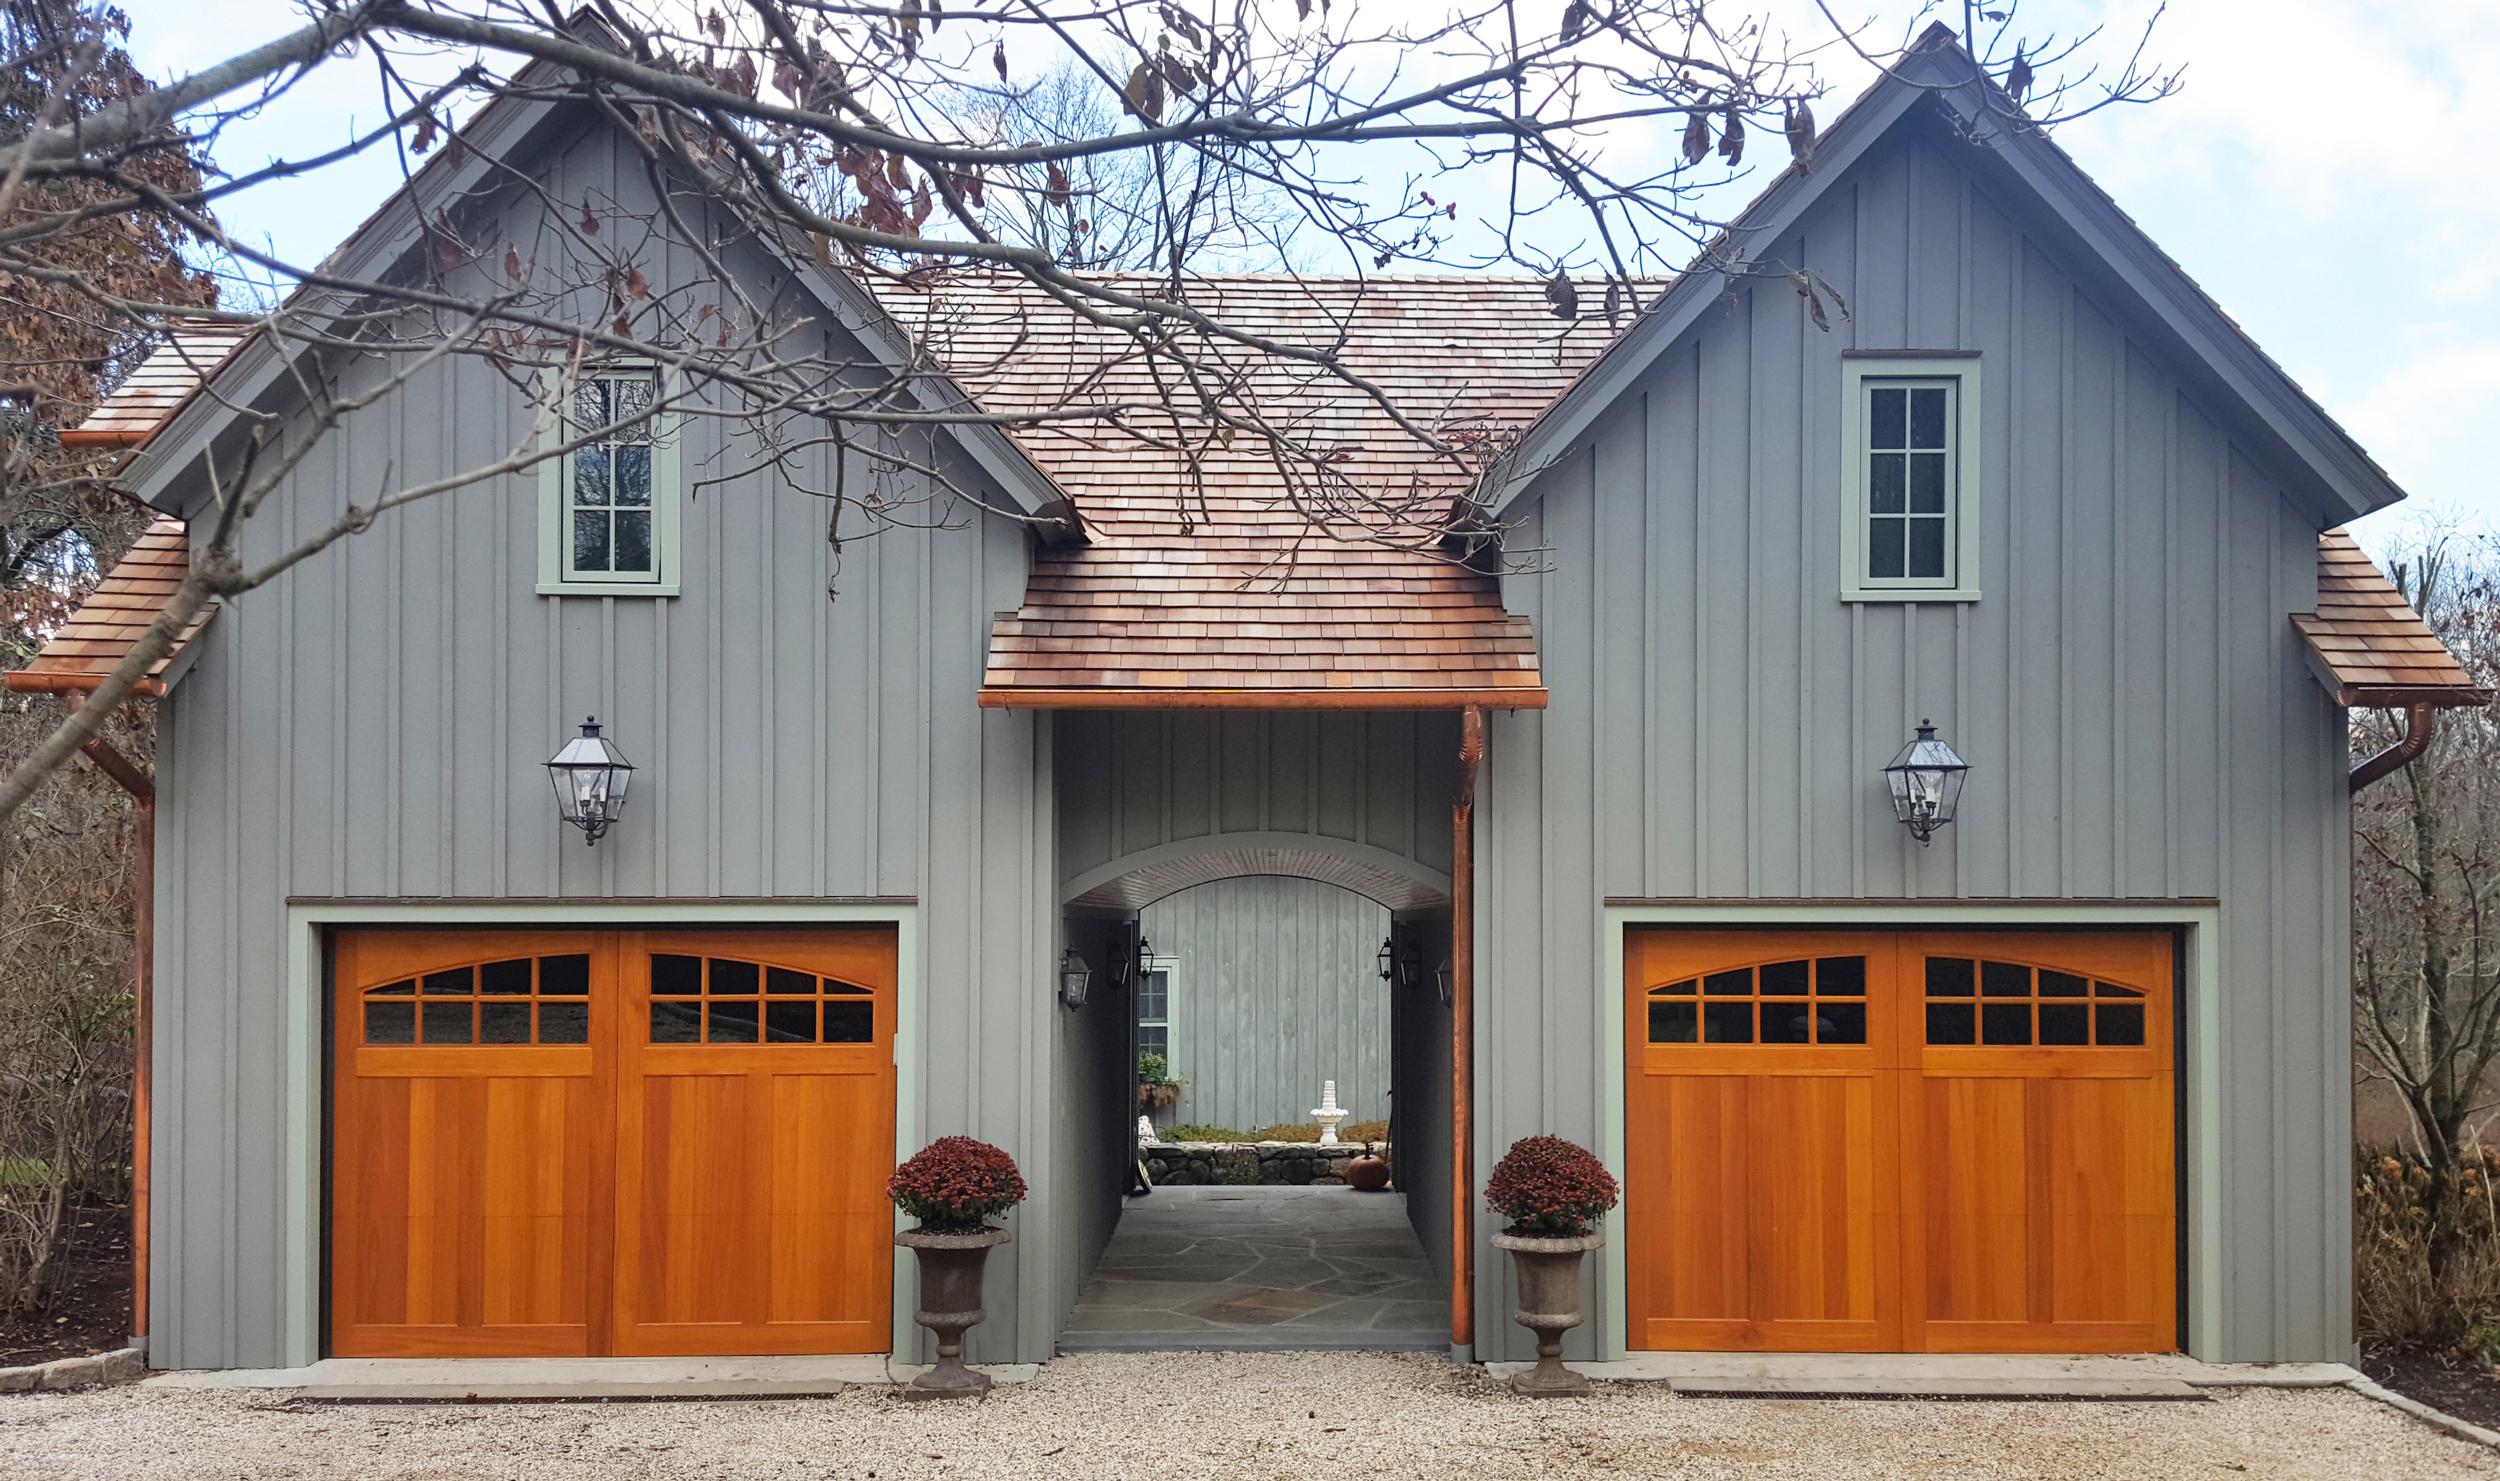 Ridgefield-carriage-house-front-symmetrical-cord fixed gi.jpg